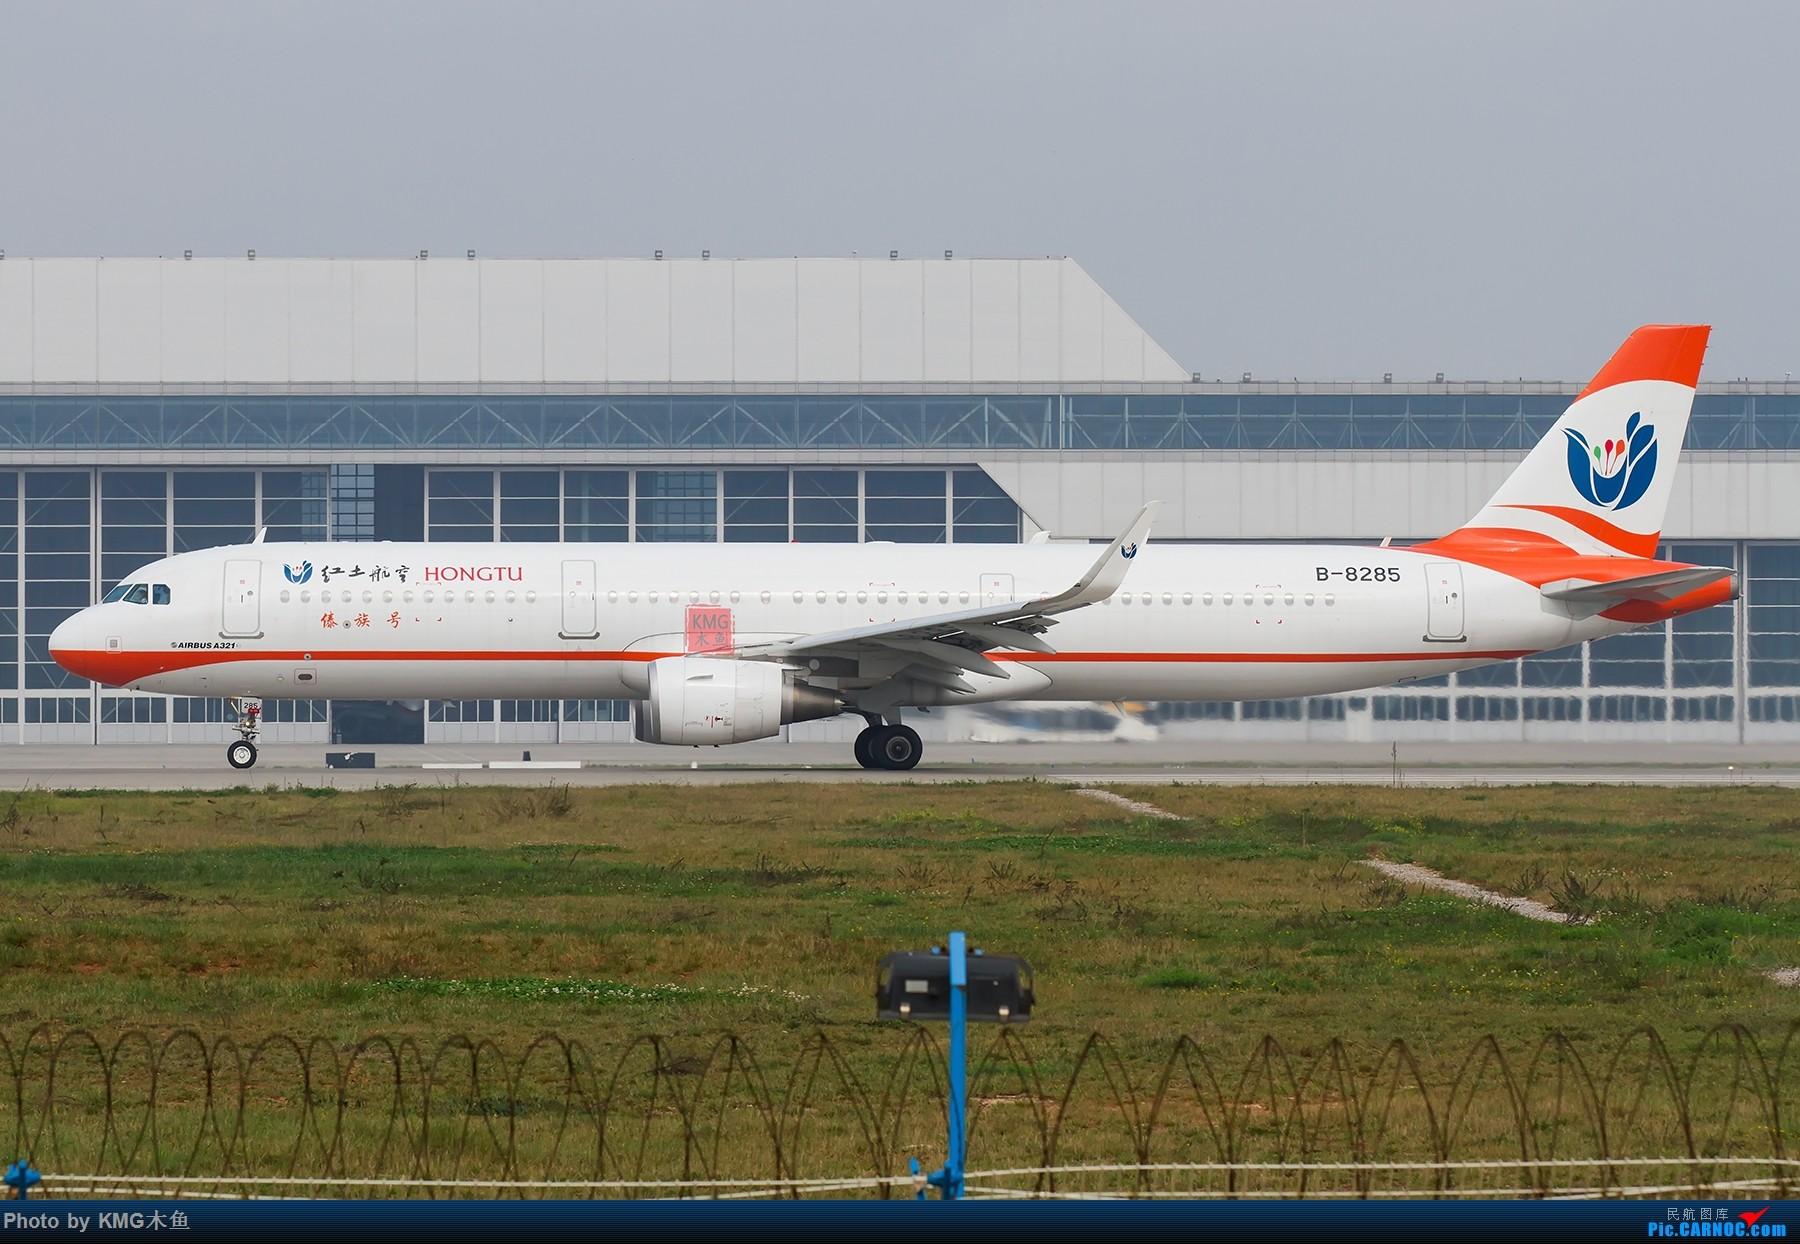 Re:[原创]【昆明长水国际机场—KMG木鱼10.16日拍机】周末拍机,有宽体,有彩绘,少了小伙伴们,独自一人拍机 AIRBUS A321-200 B-8285 中国昆明长水国际机场